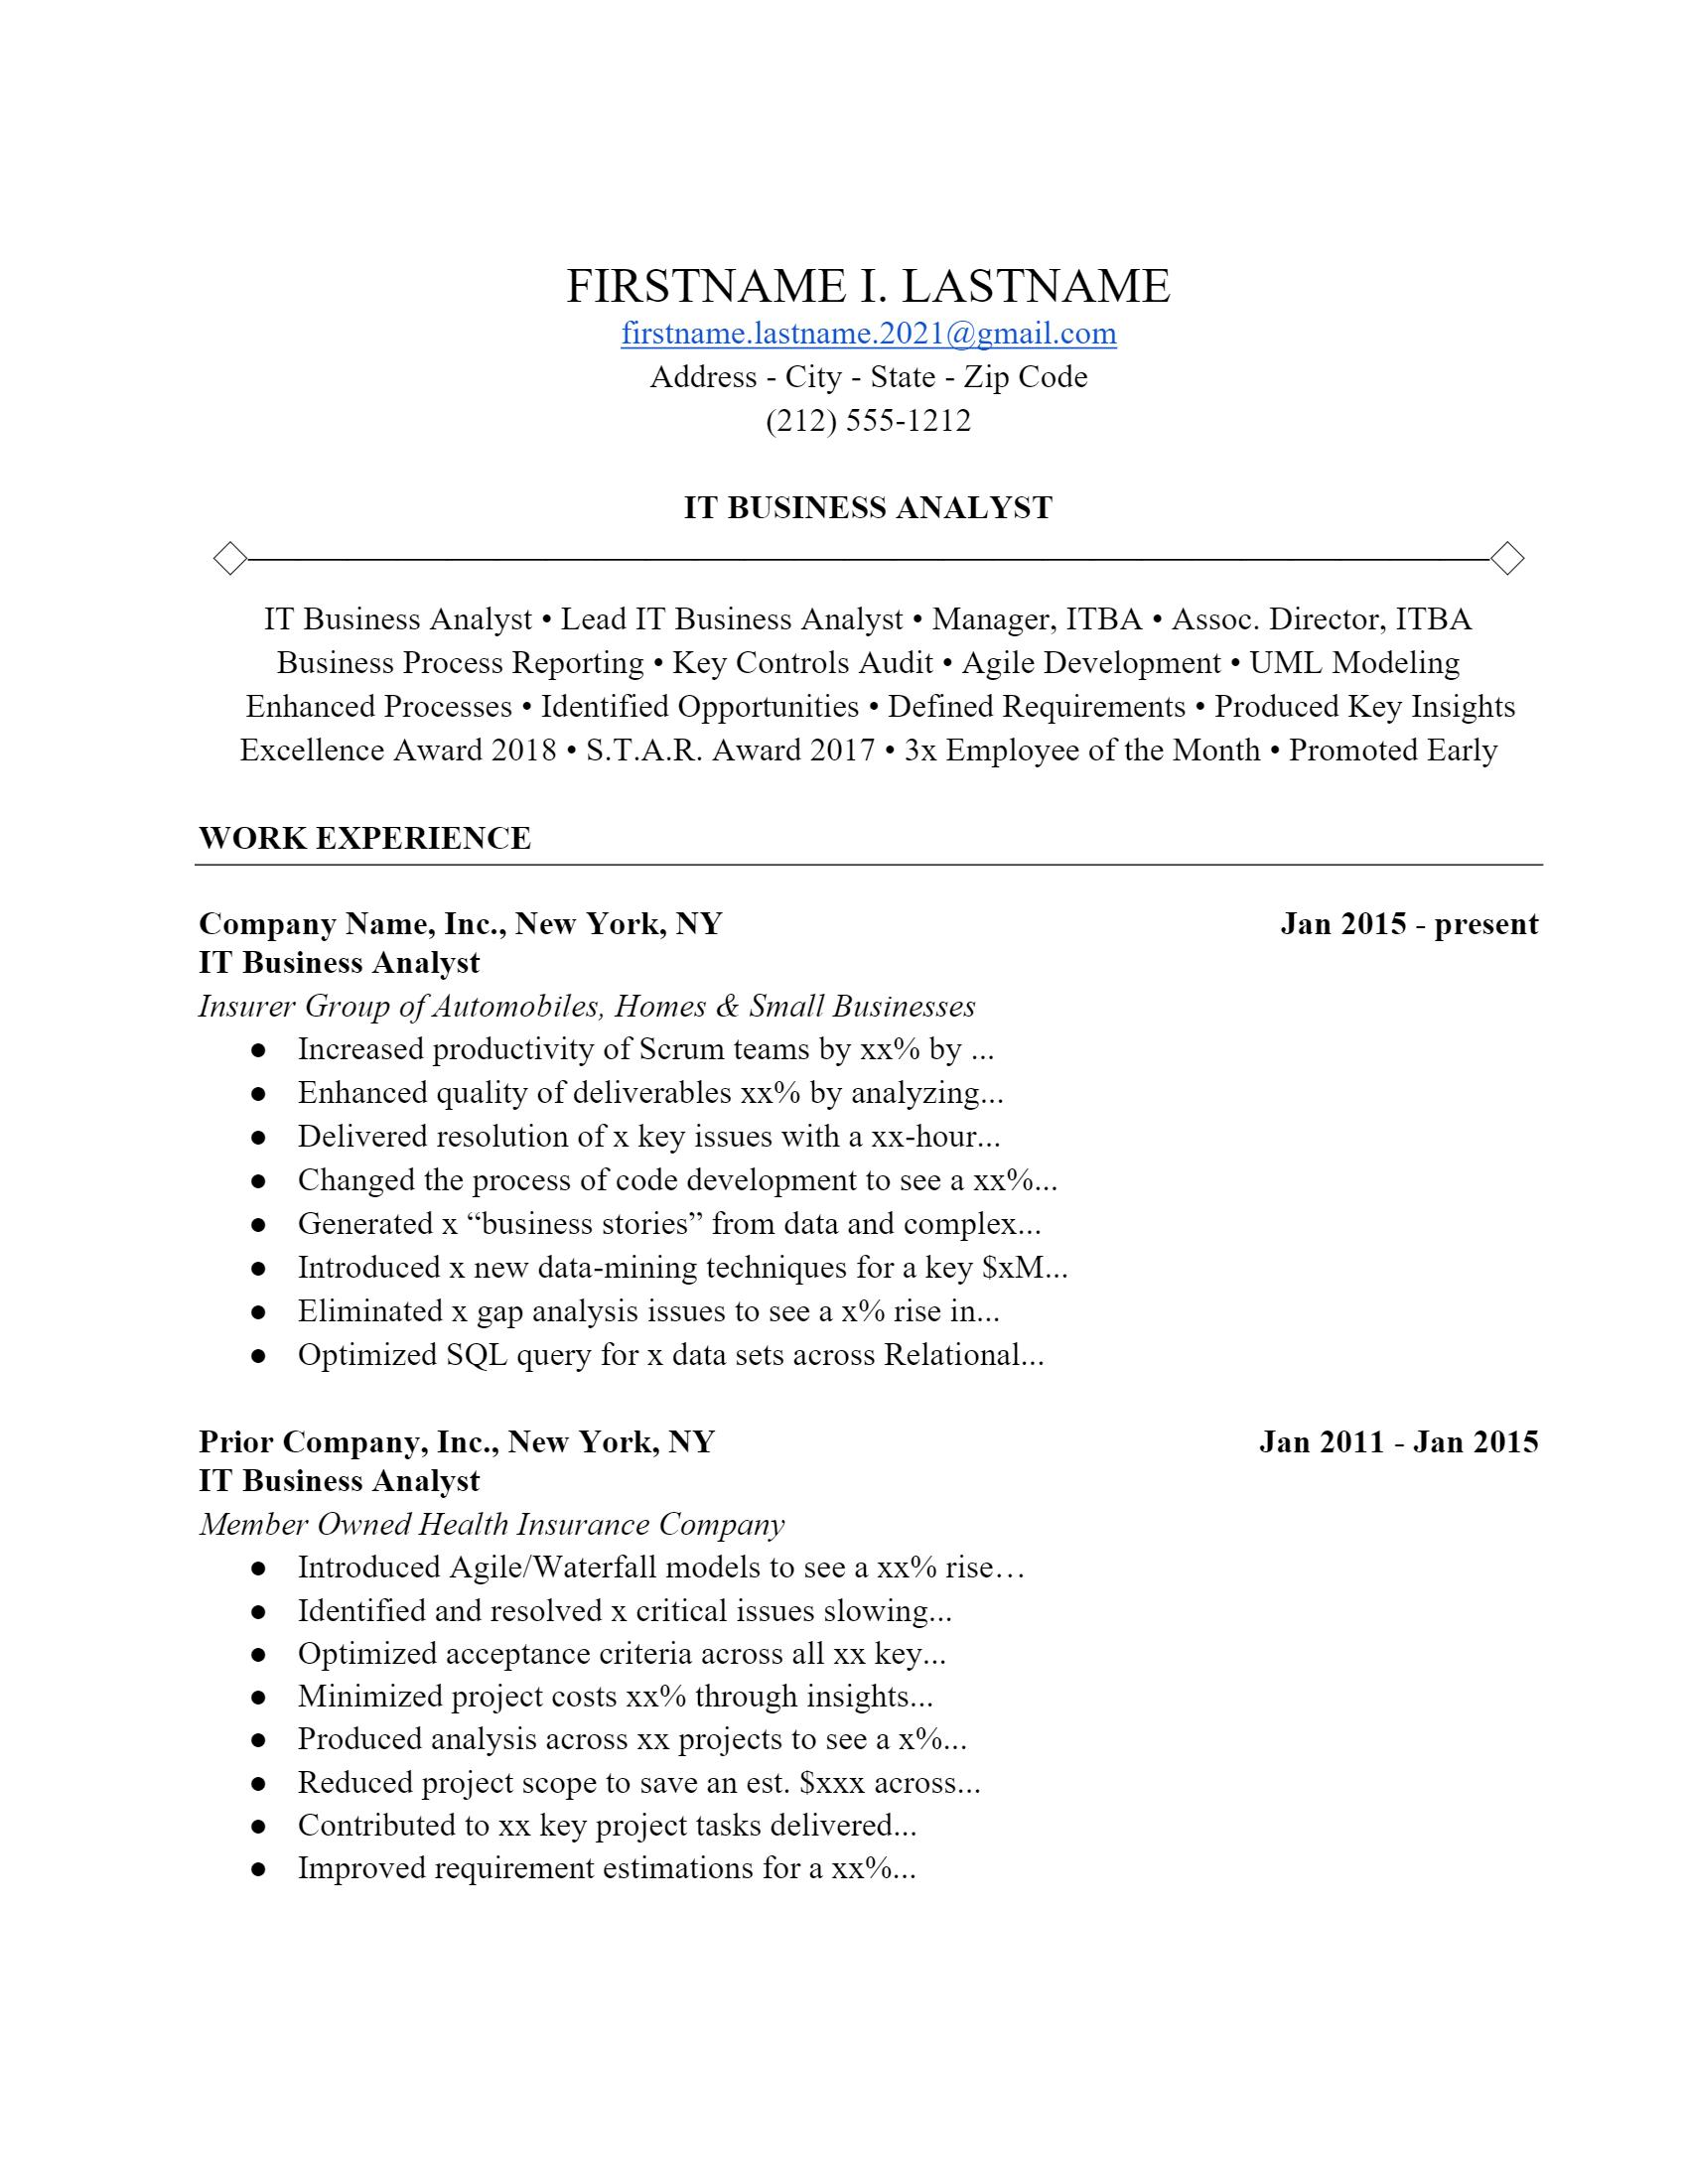 IT Analyst Resume .Docx (Word)